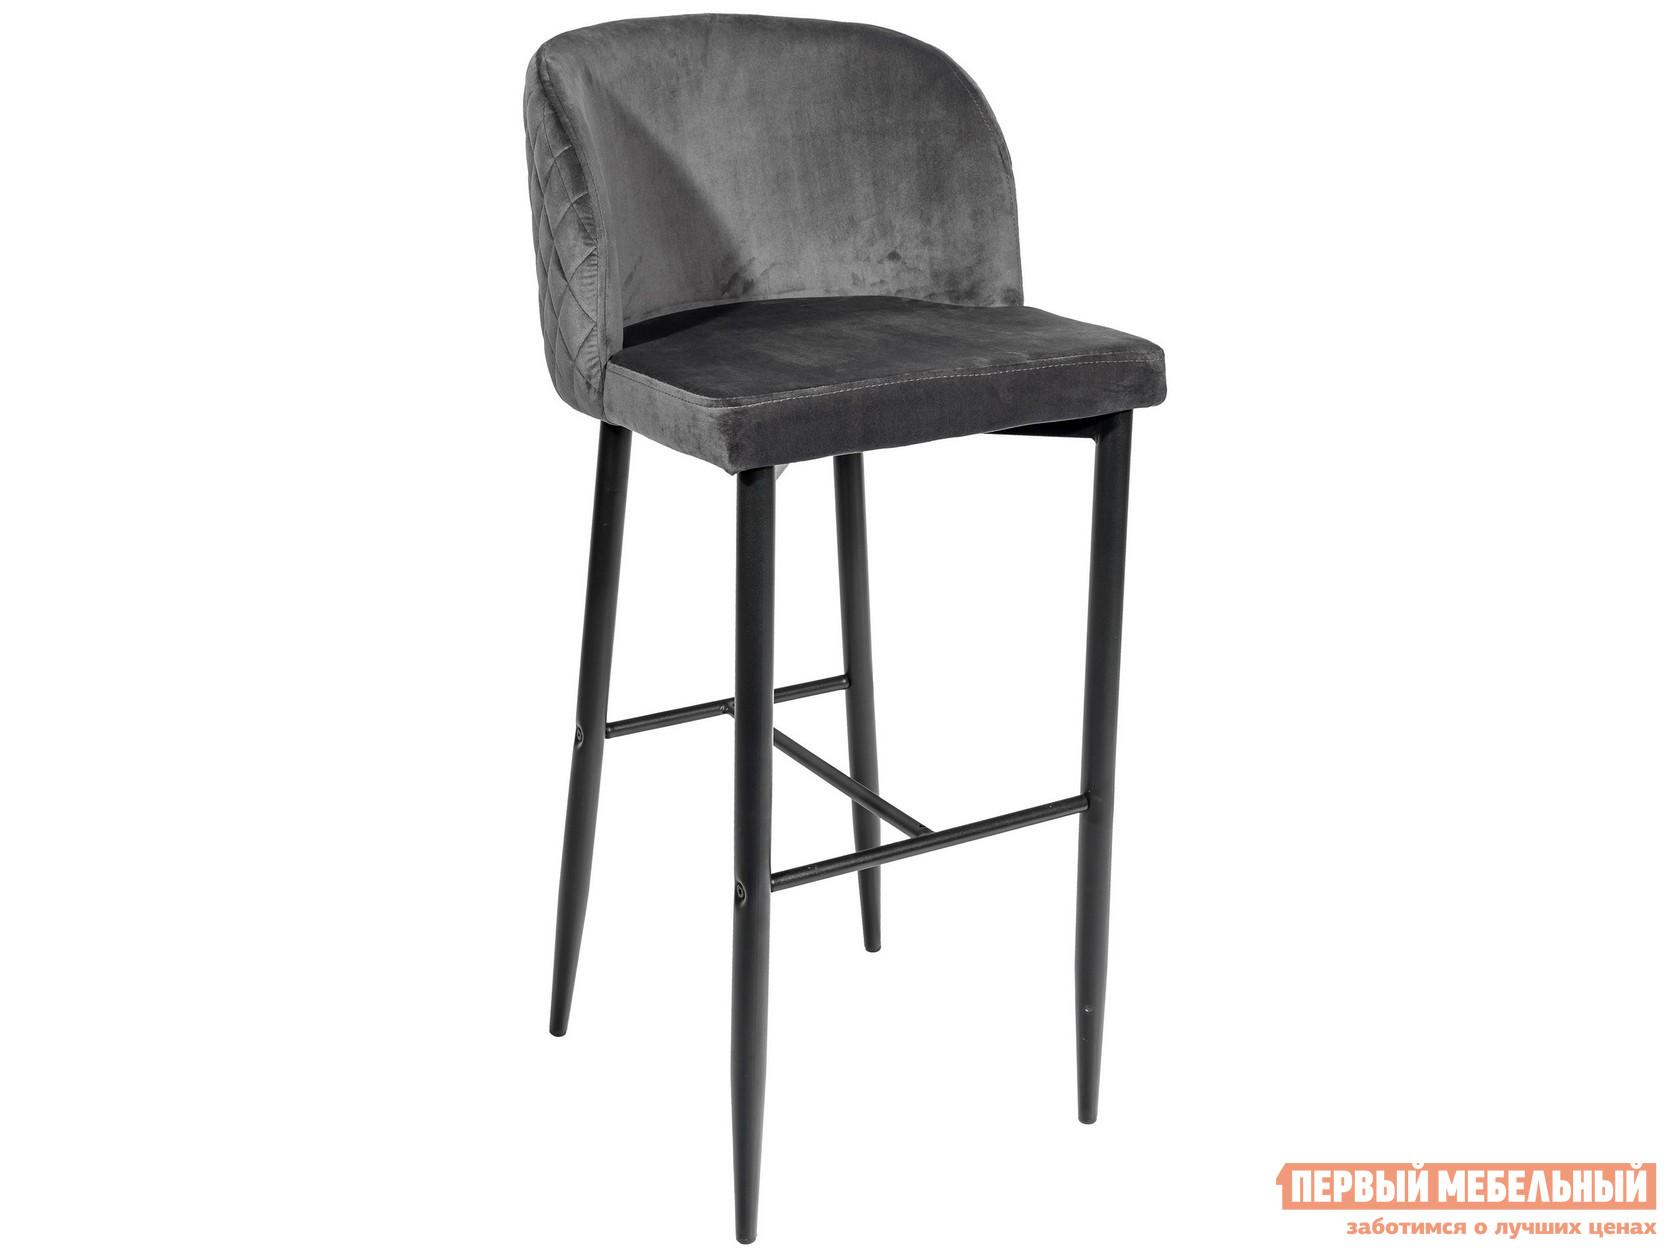 Барный стул  MC11B HLR-21 Серый, велюр Stool Group 85893